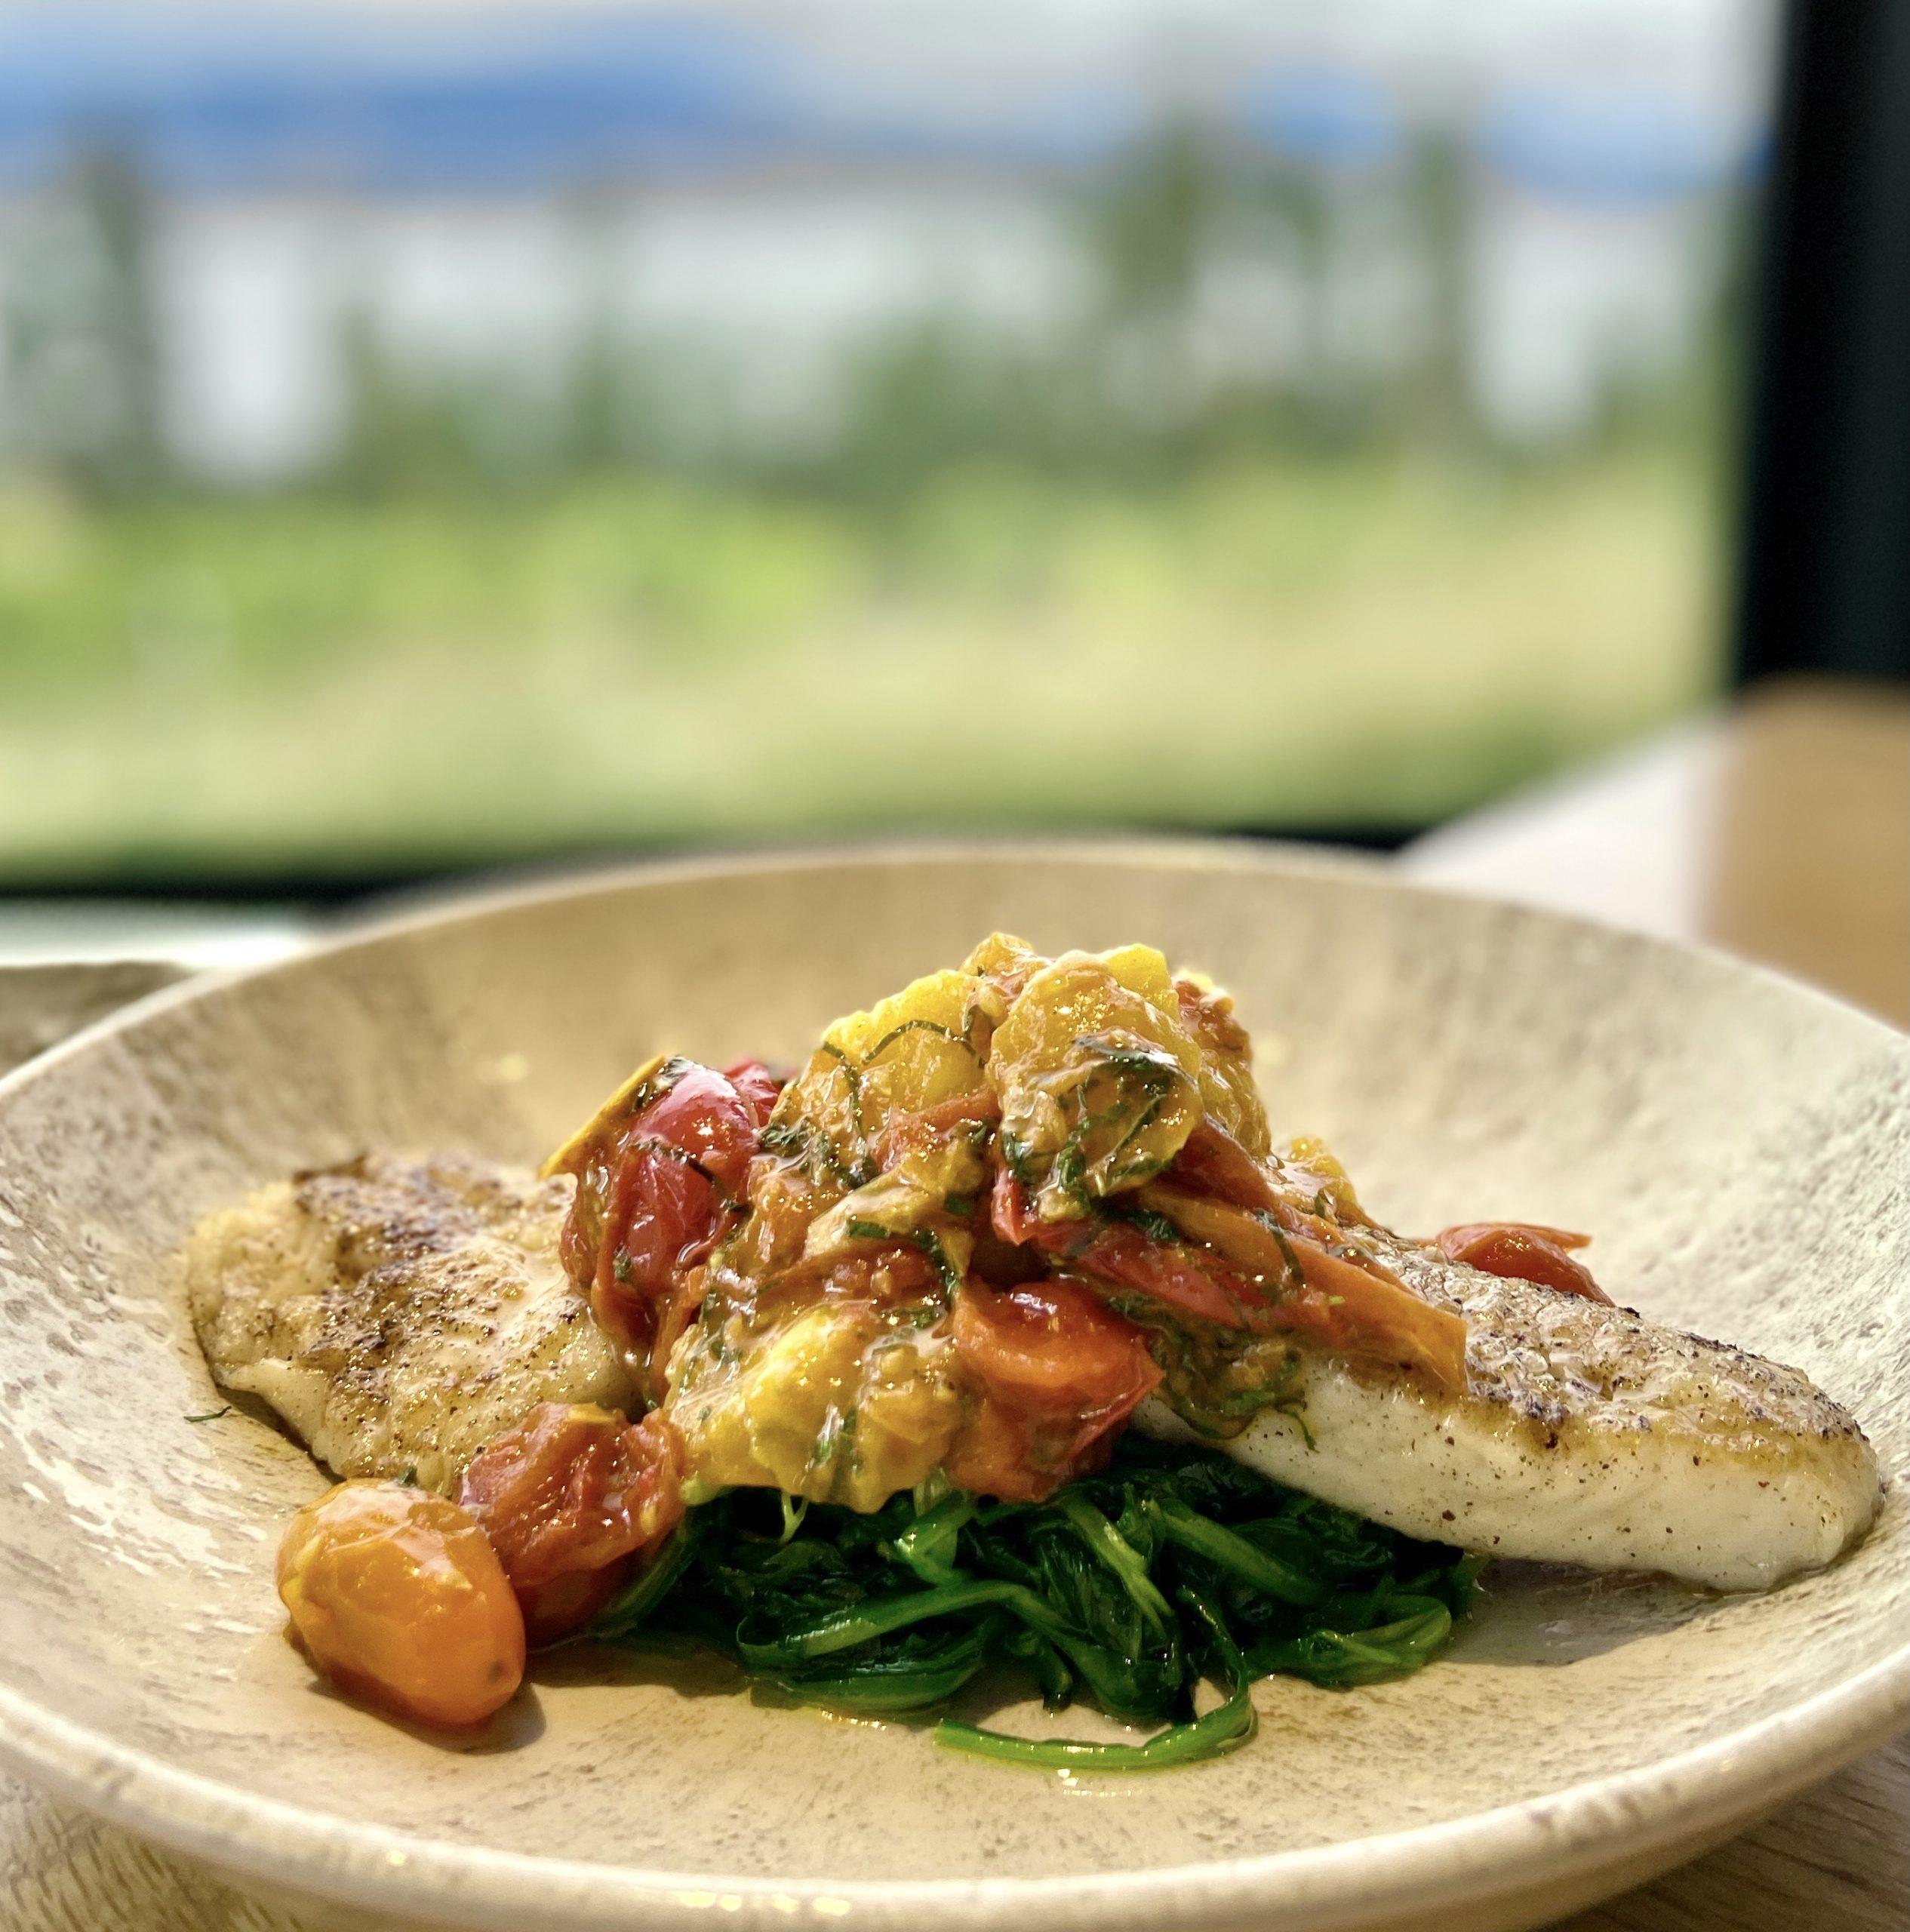 cedarcreek-grilled-fish-home-block